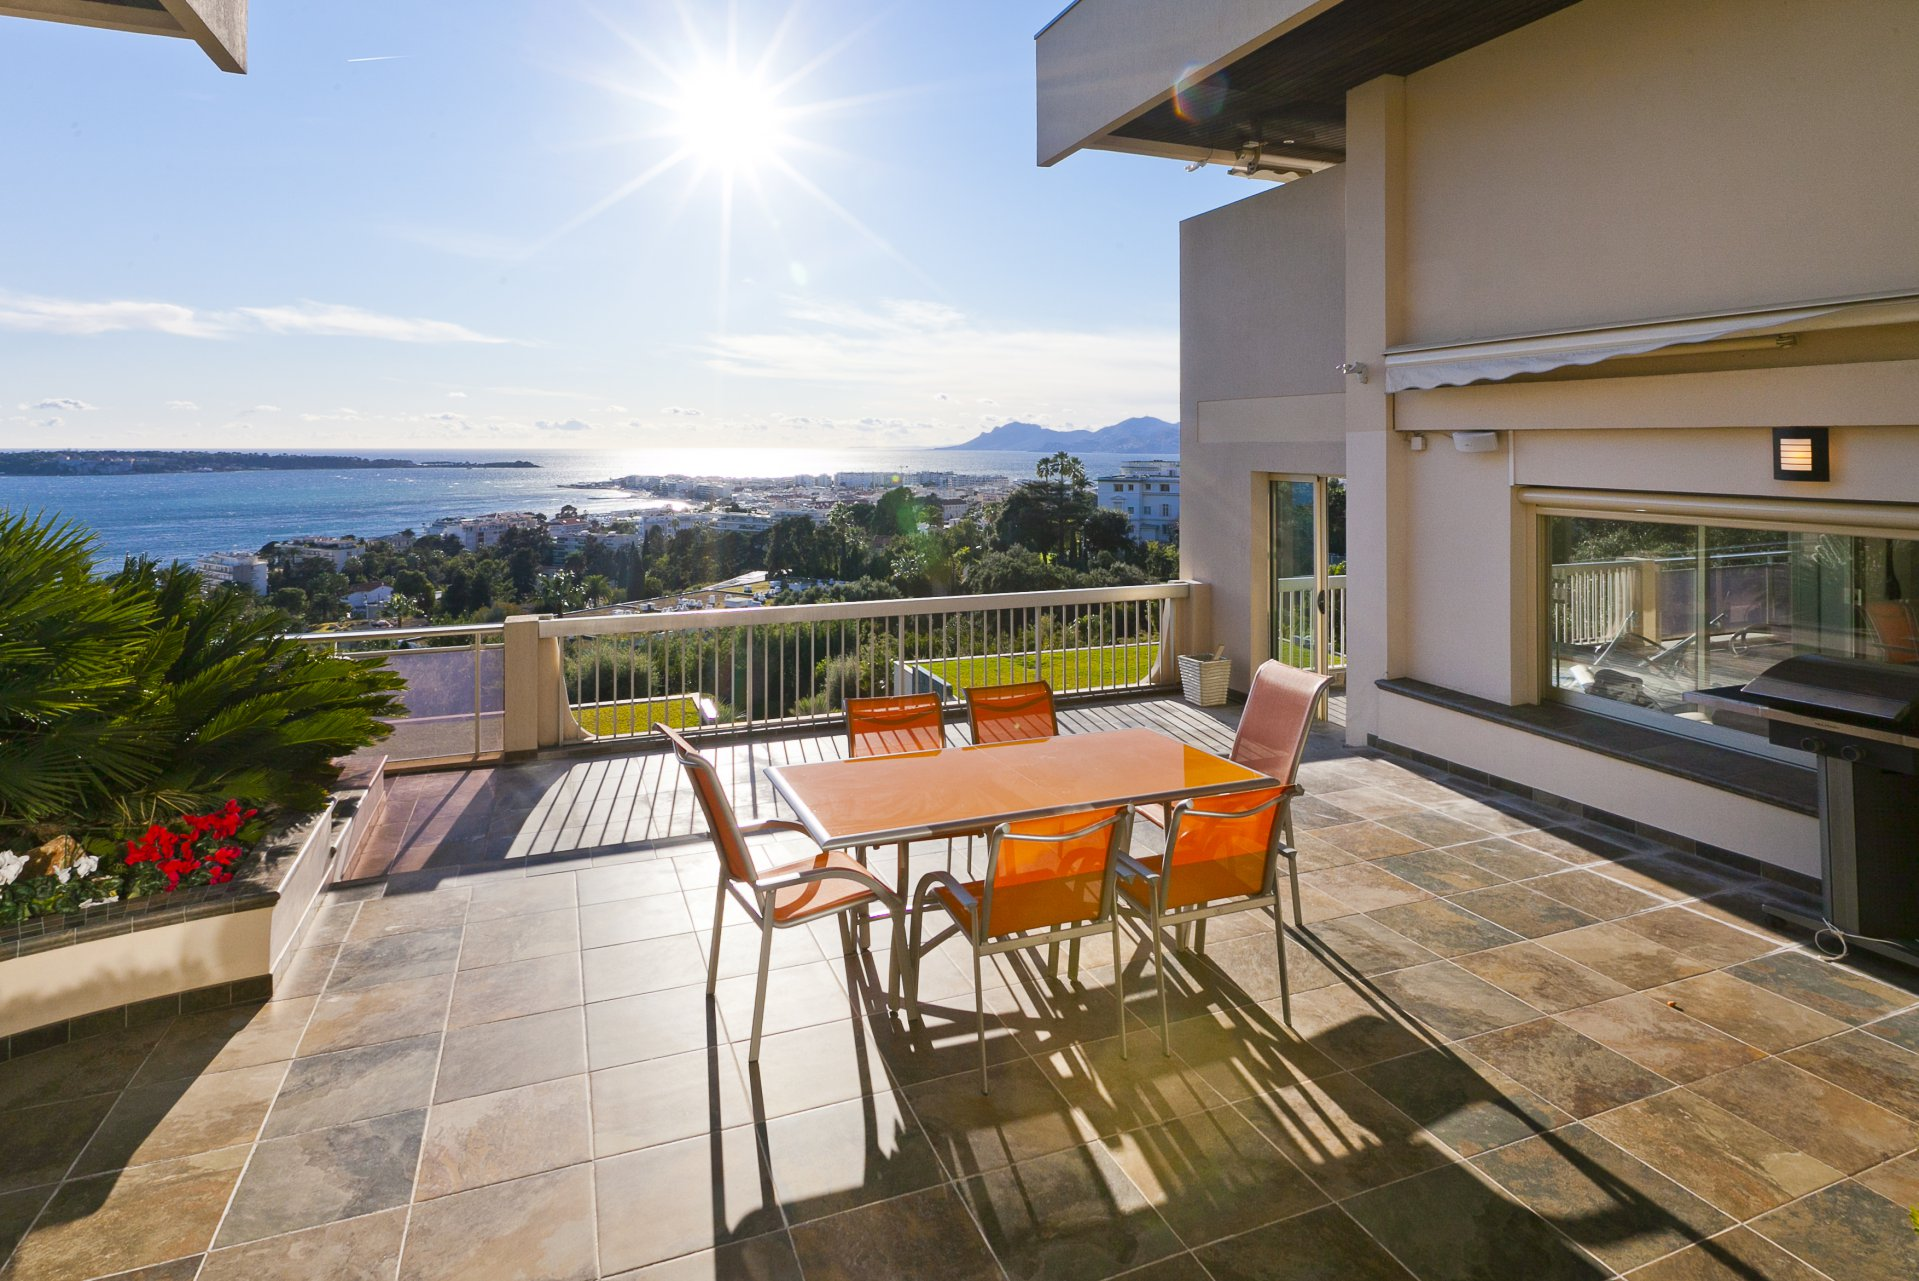 annonce location saisonni re appartement cannes basse californie 06400 6 couchages ref l0833ca. Black Bedroom Furniture Sets. Home Design Ideas